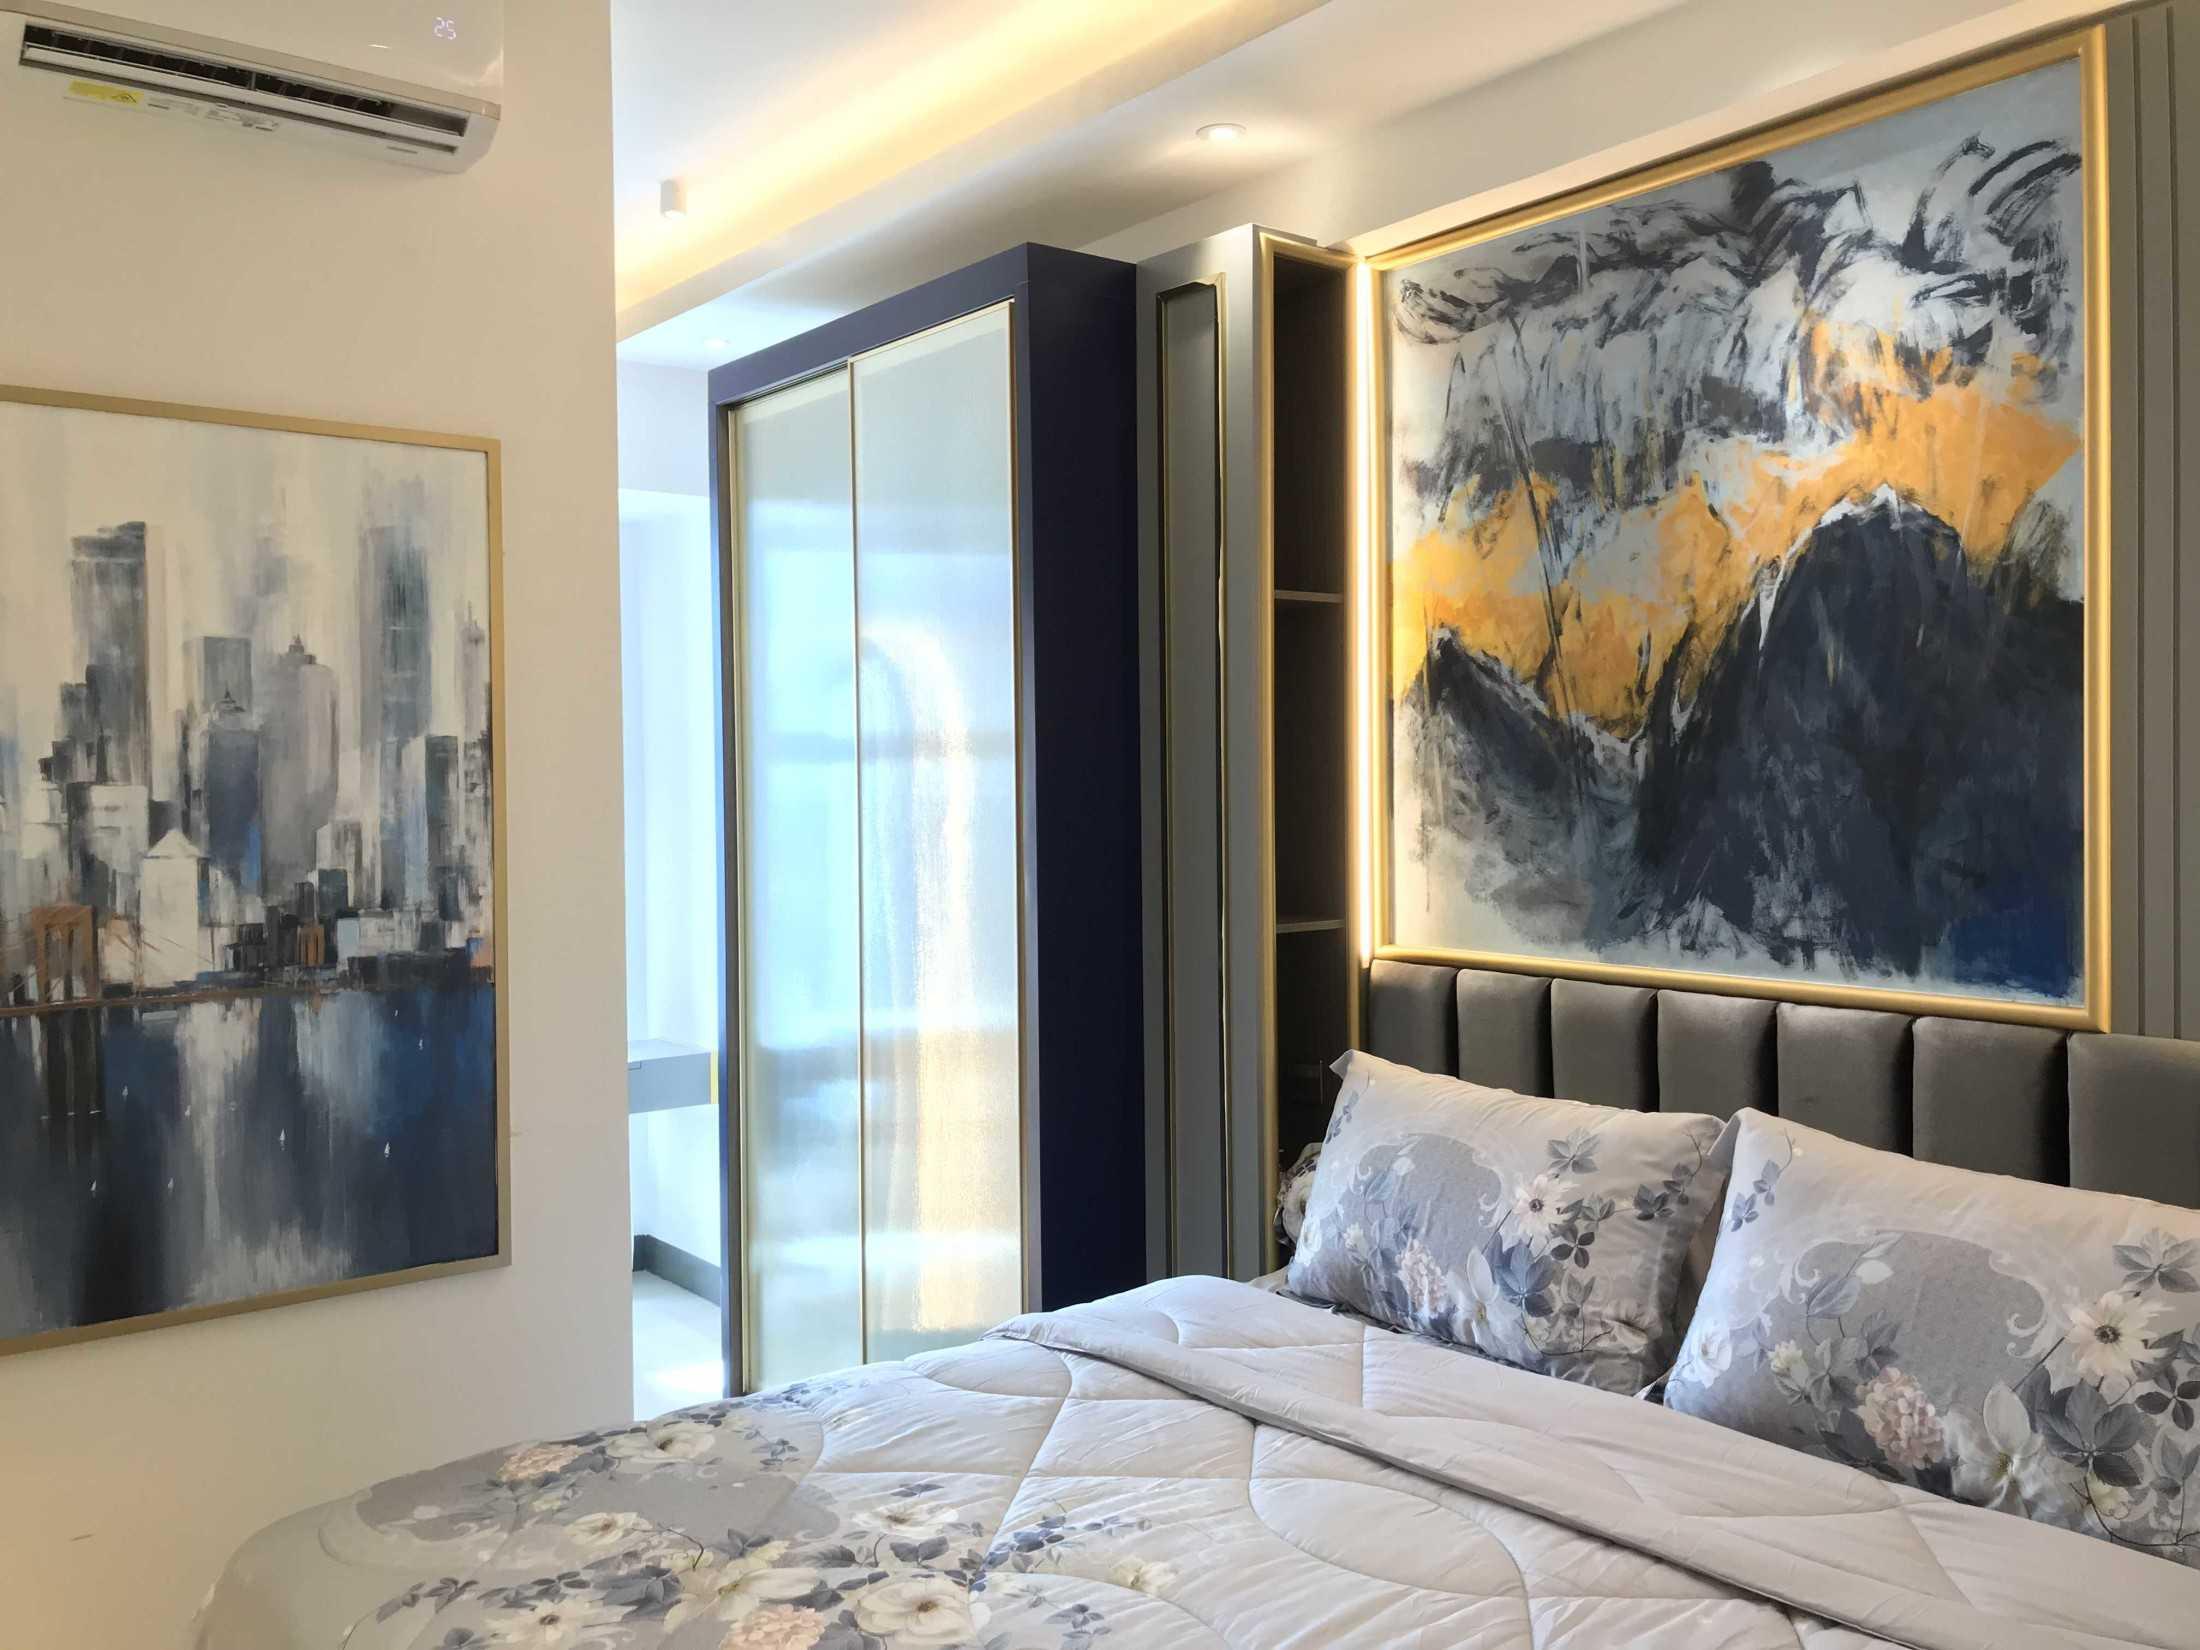 Yulianto Gunawan Apartment Project Surabaya, Kota Sby, Jawa Timur, Indonesia Surabaya, Kota Sby, Jawa Timur, Indonesia Yulianto-Gunawan-Apartment-Project  129029